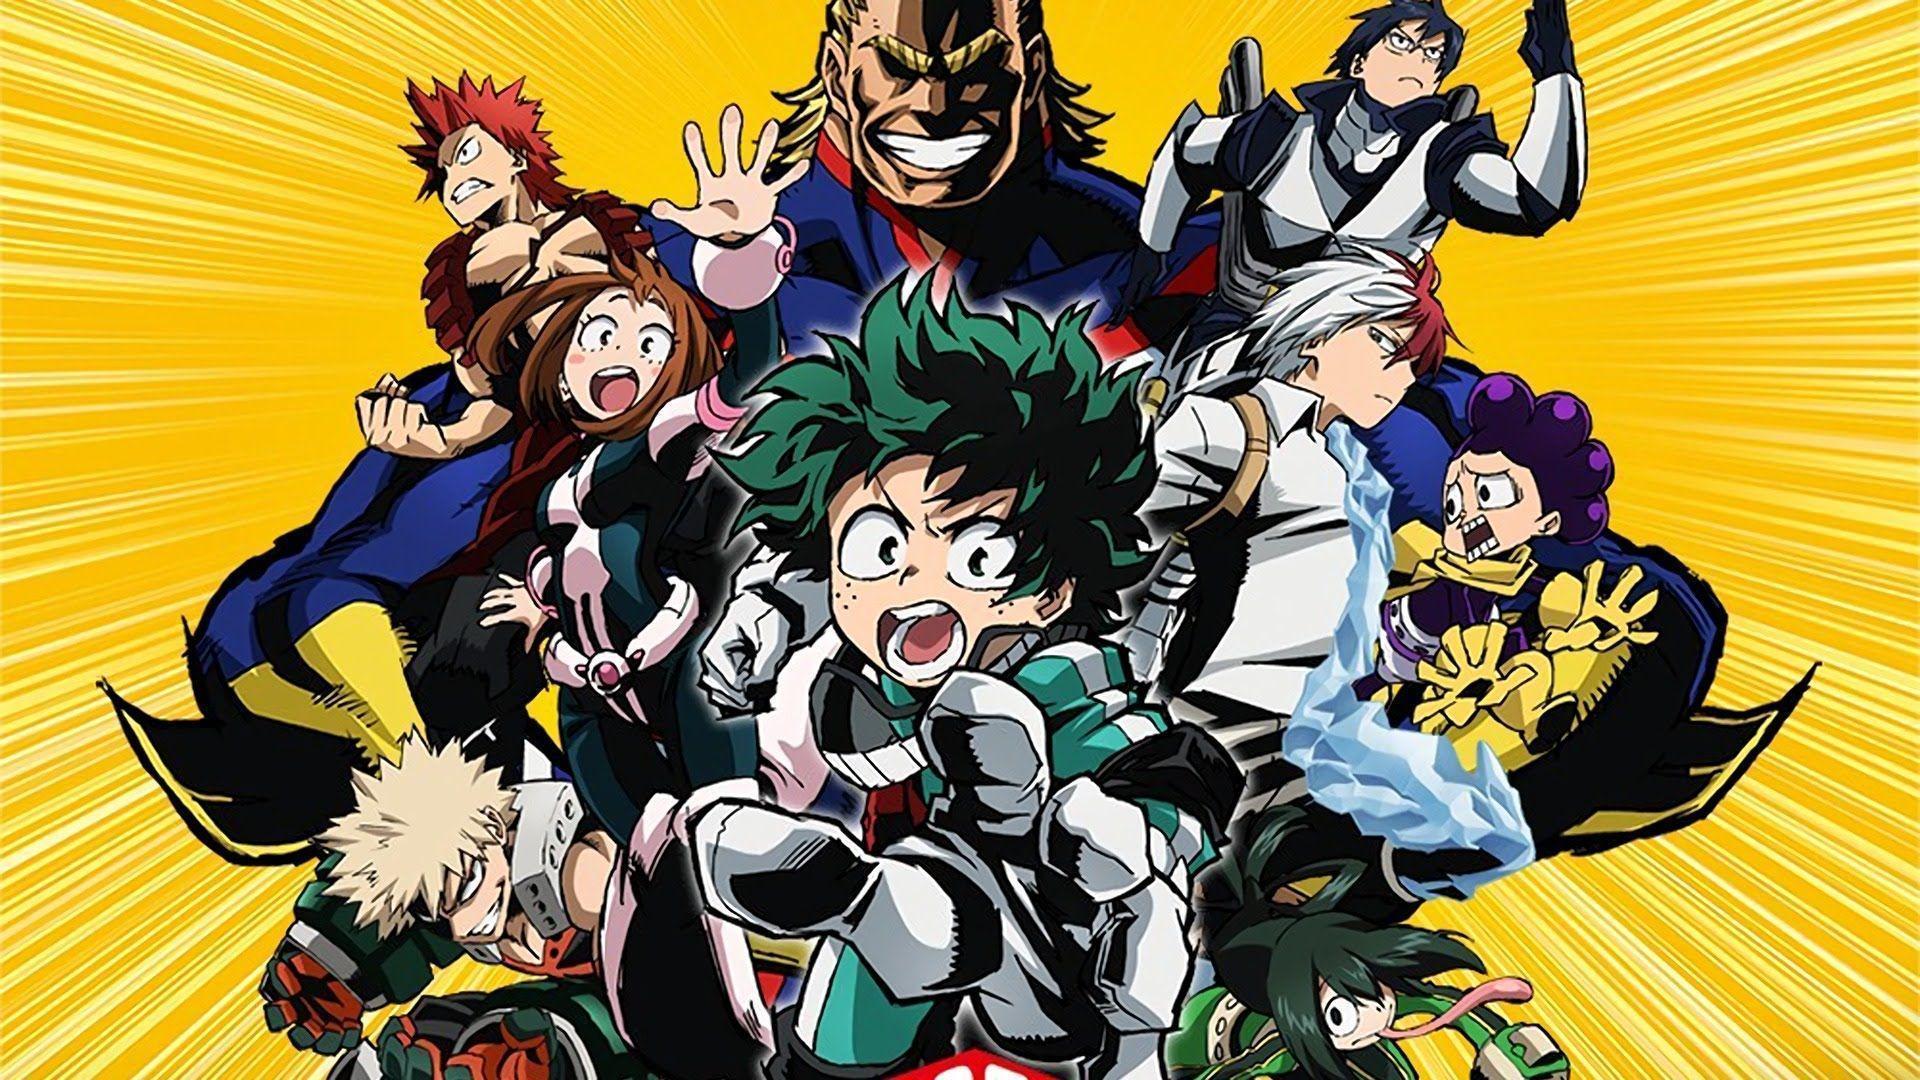 Tododeku boku no hero academia wallpapers. My Hero Academia Wallpapers - Top Free My Hero Academia ...